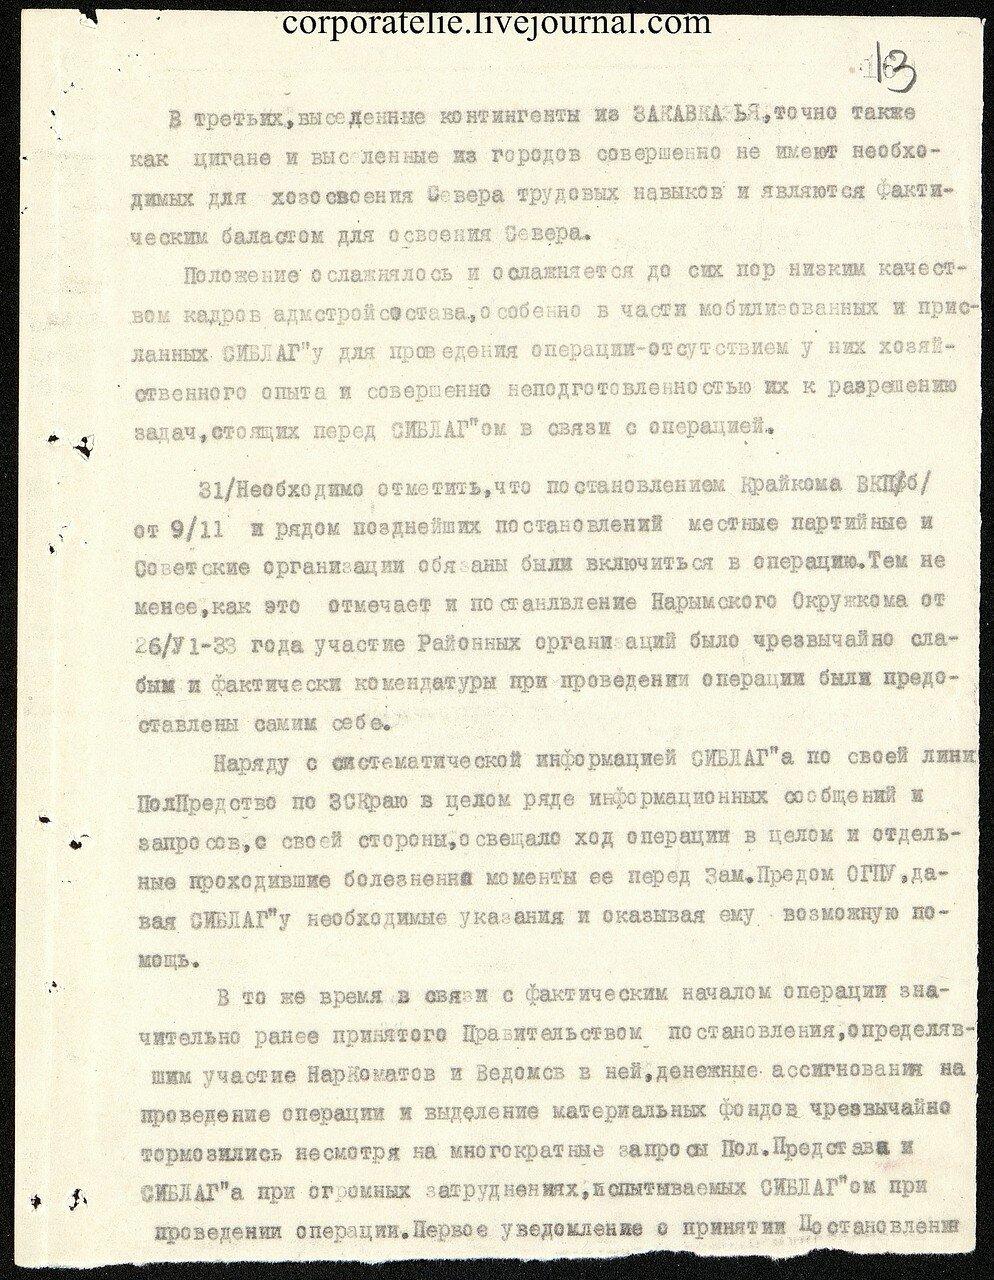 https://img-fotki.yandex.ru/get/94189/224693804.1b/0_13ee0b_76b222ba_XXXL.jpg